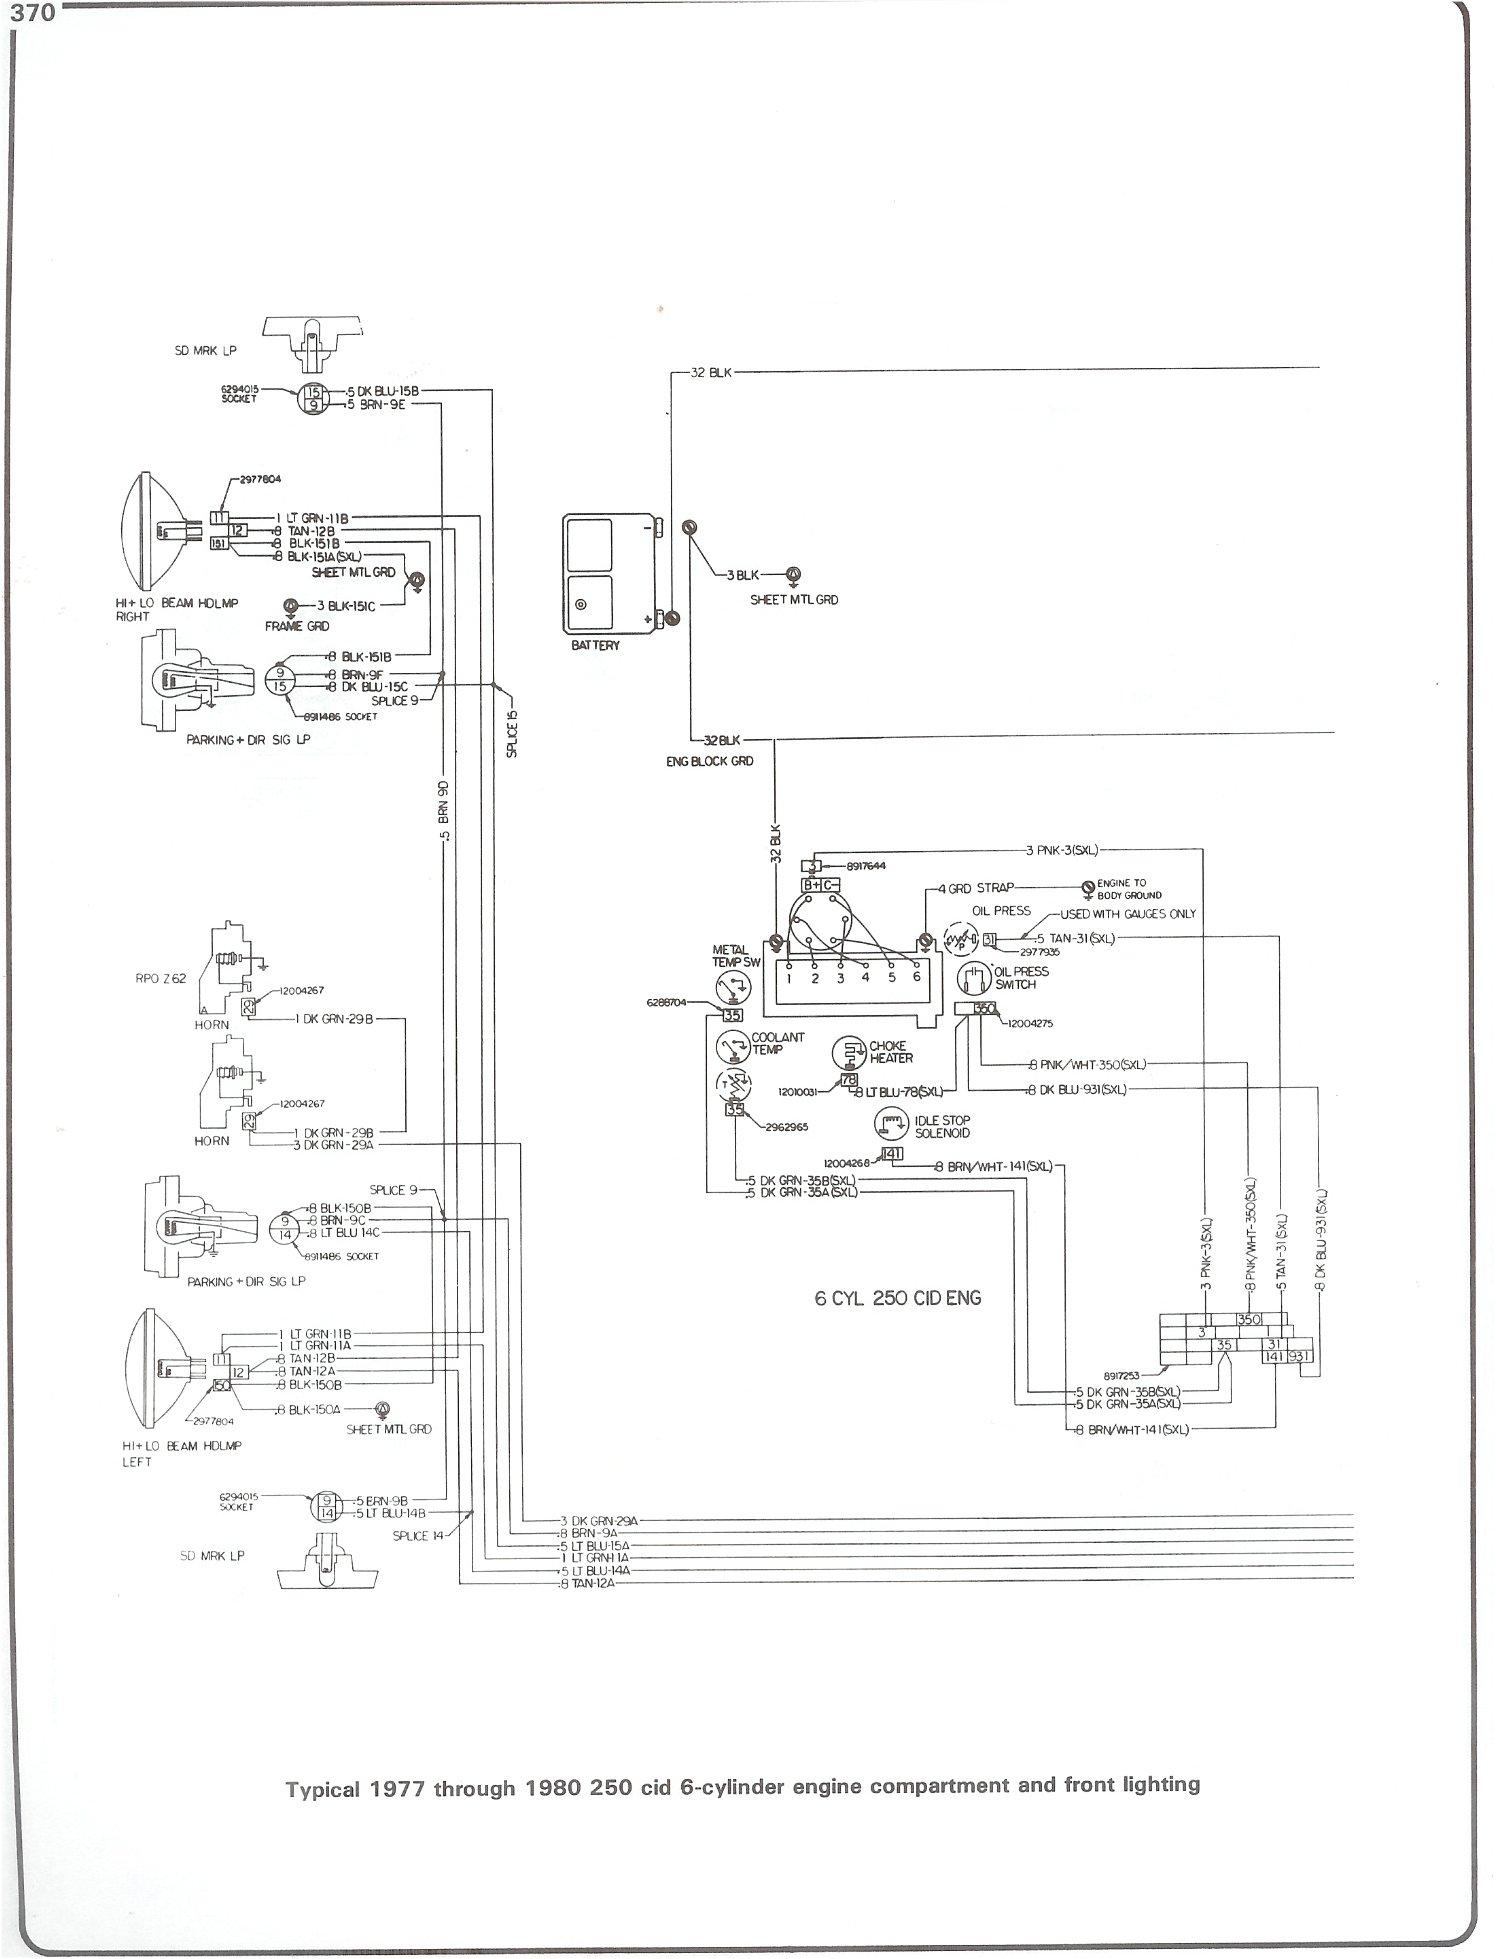 Enjoyable 1976 Chevy Truck Wiring Schematic Basic Electronics Wiring Diagram Wiring Cloud Licukaidewilluminateatxorg